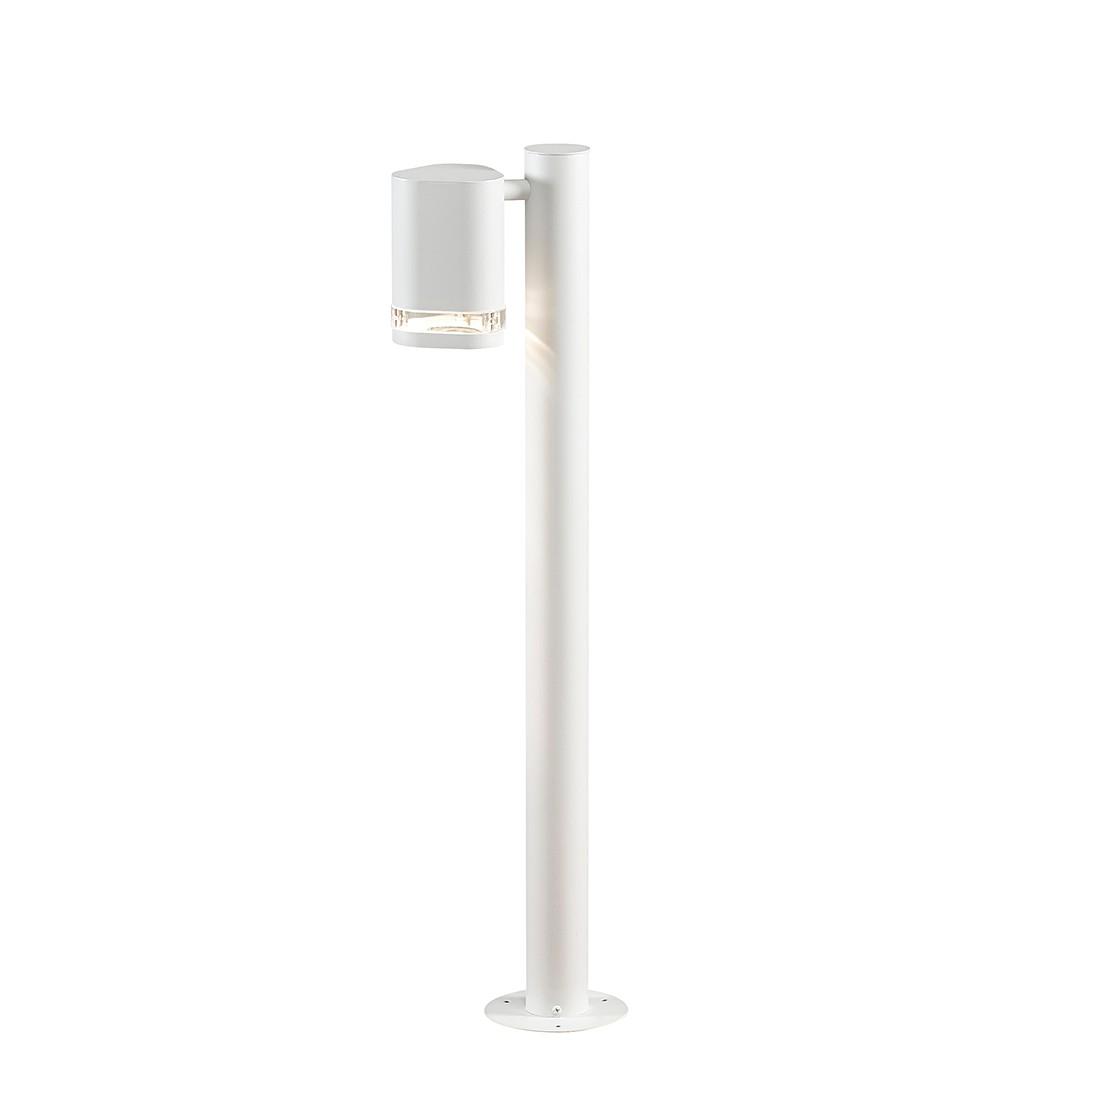 EEK A++, Halogen Wegeleuchte Modena - Aluminium/Glas - 1-flammig, Konstsmide